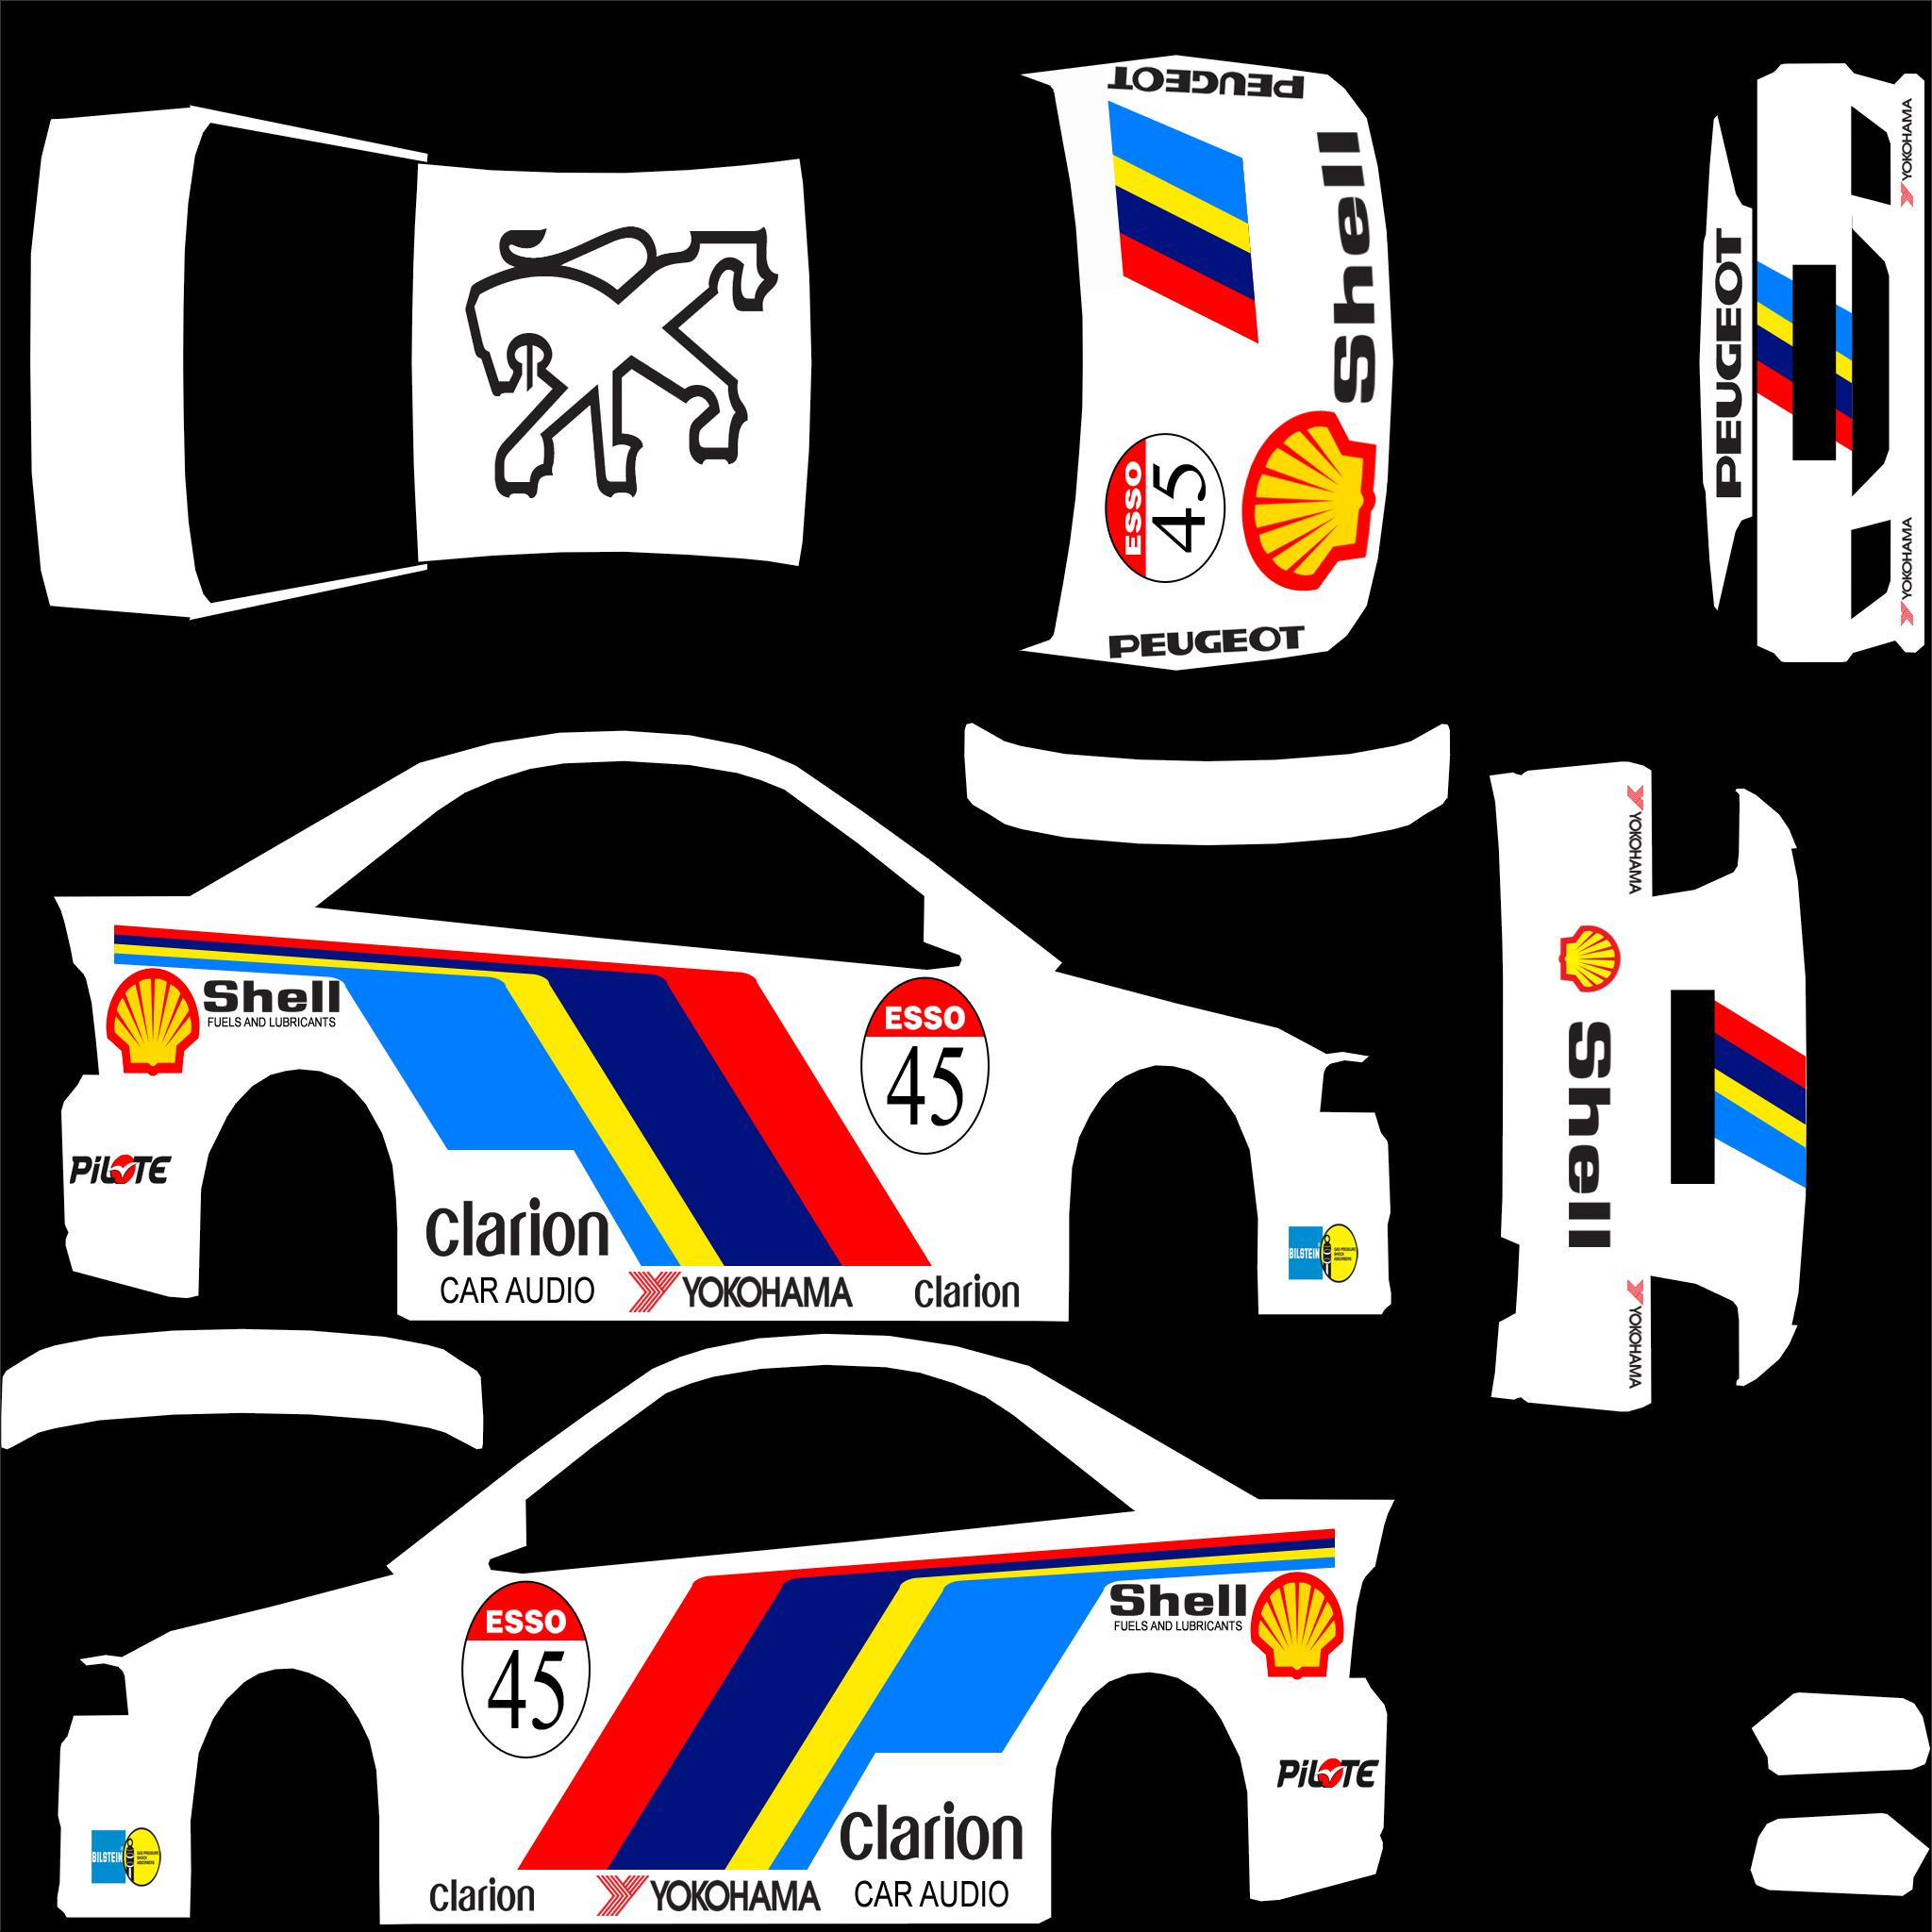 FXO BTCC Peugeot Livery Bean0 Car Skins For Live